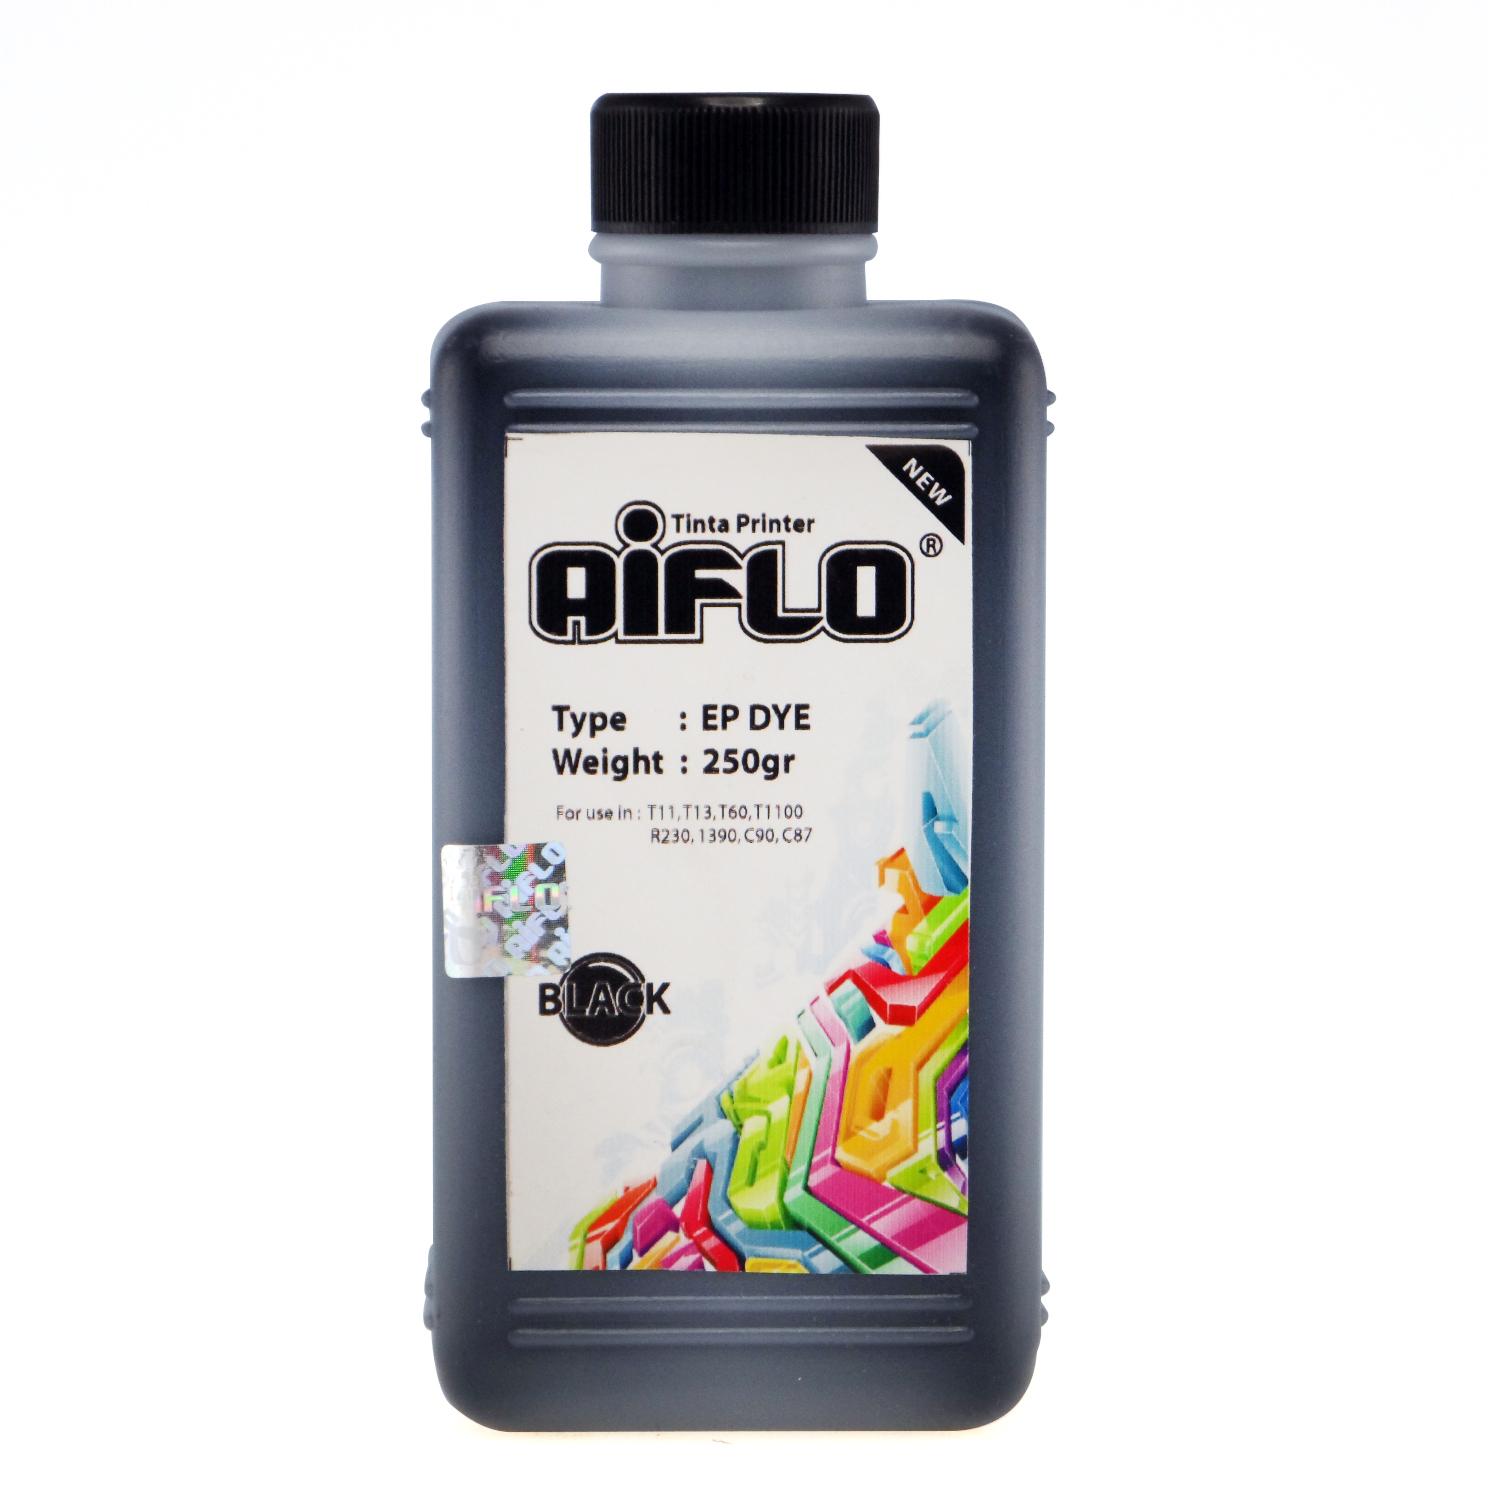 Tinta Printer Aiflo Black 250ml Untuk Epson 1390 T60 T1100 T13 R230